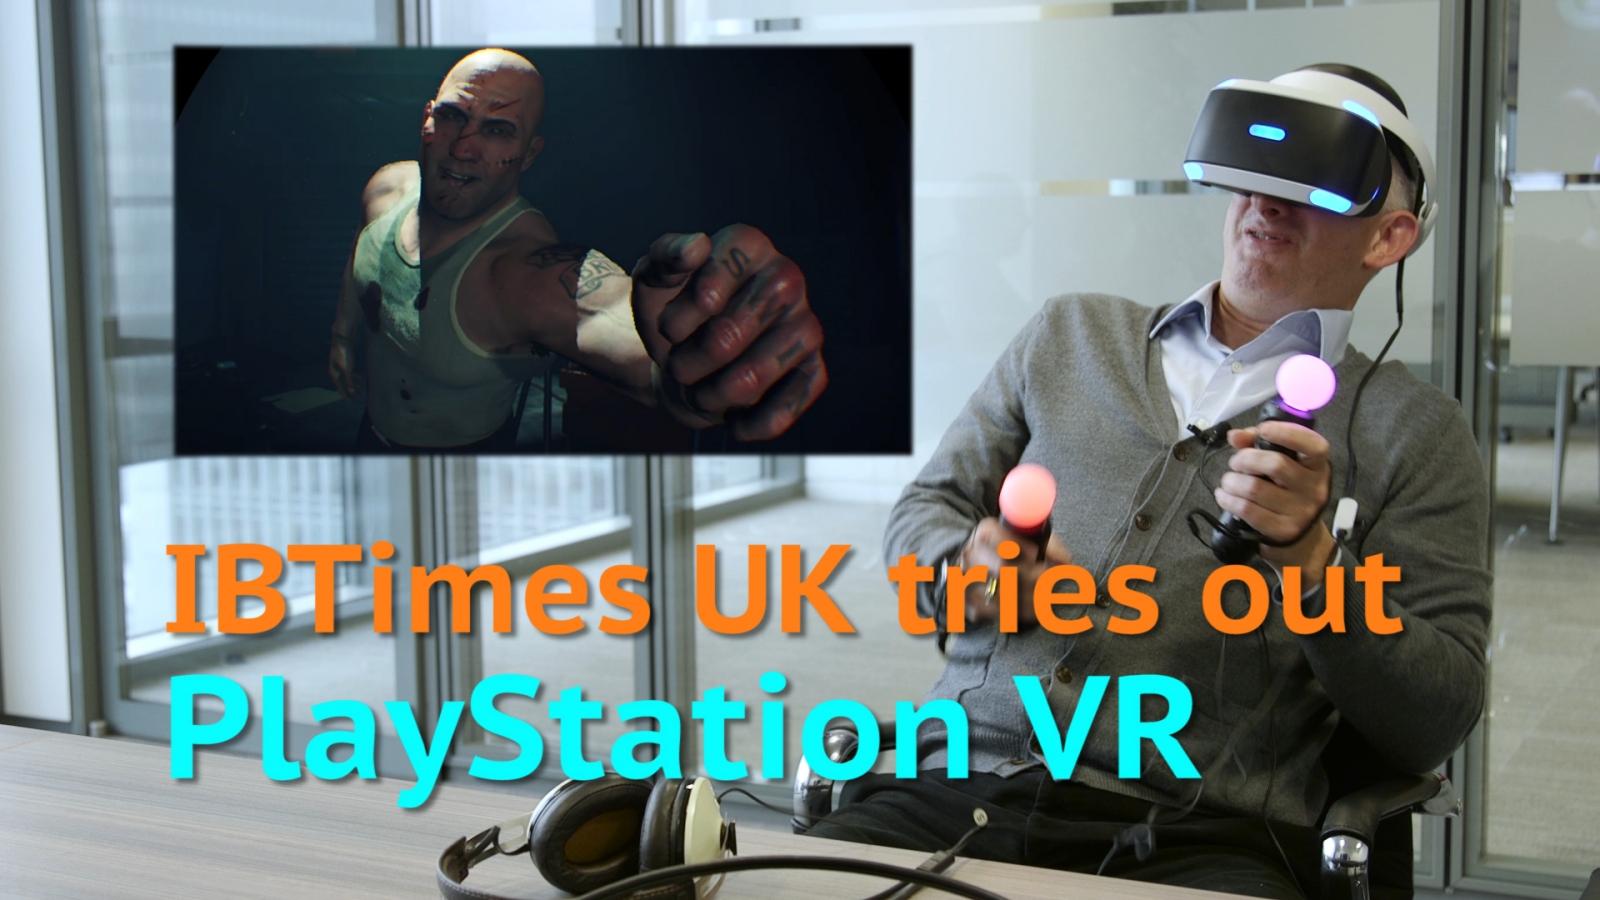 PLayStation VR reaction